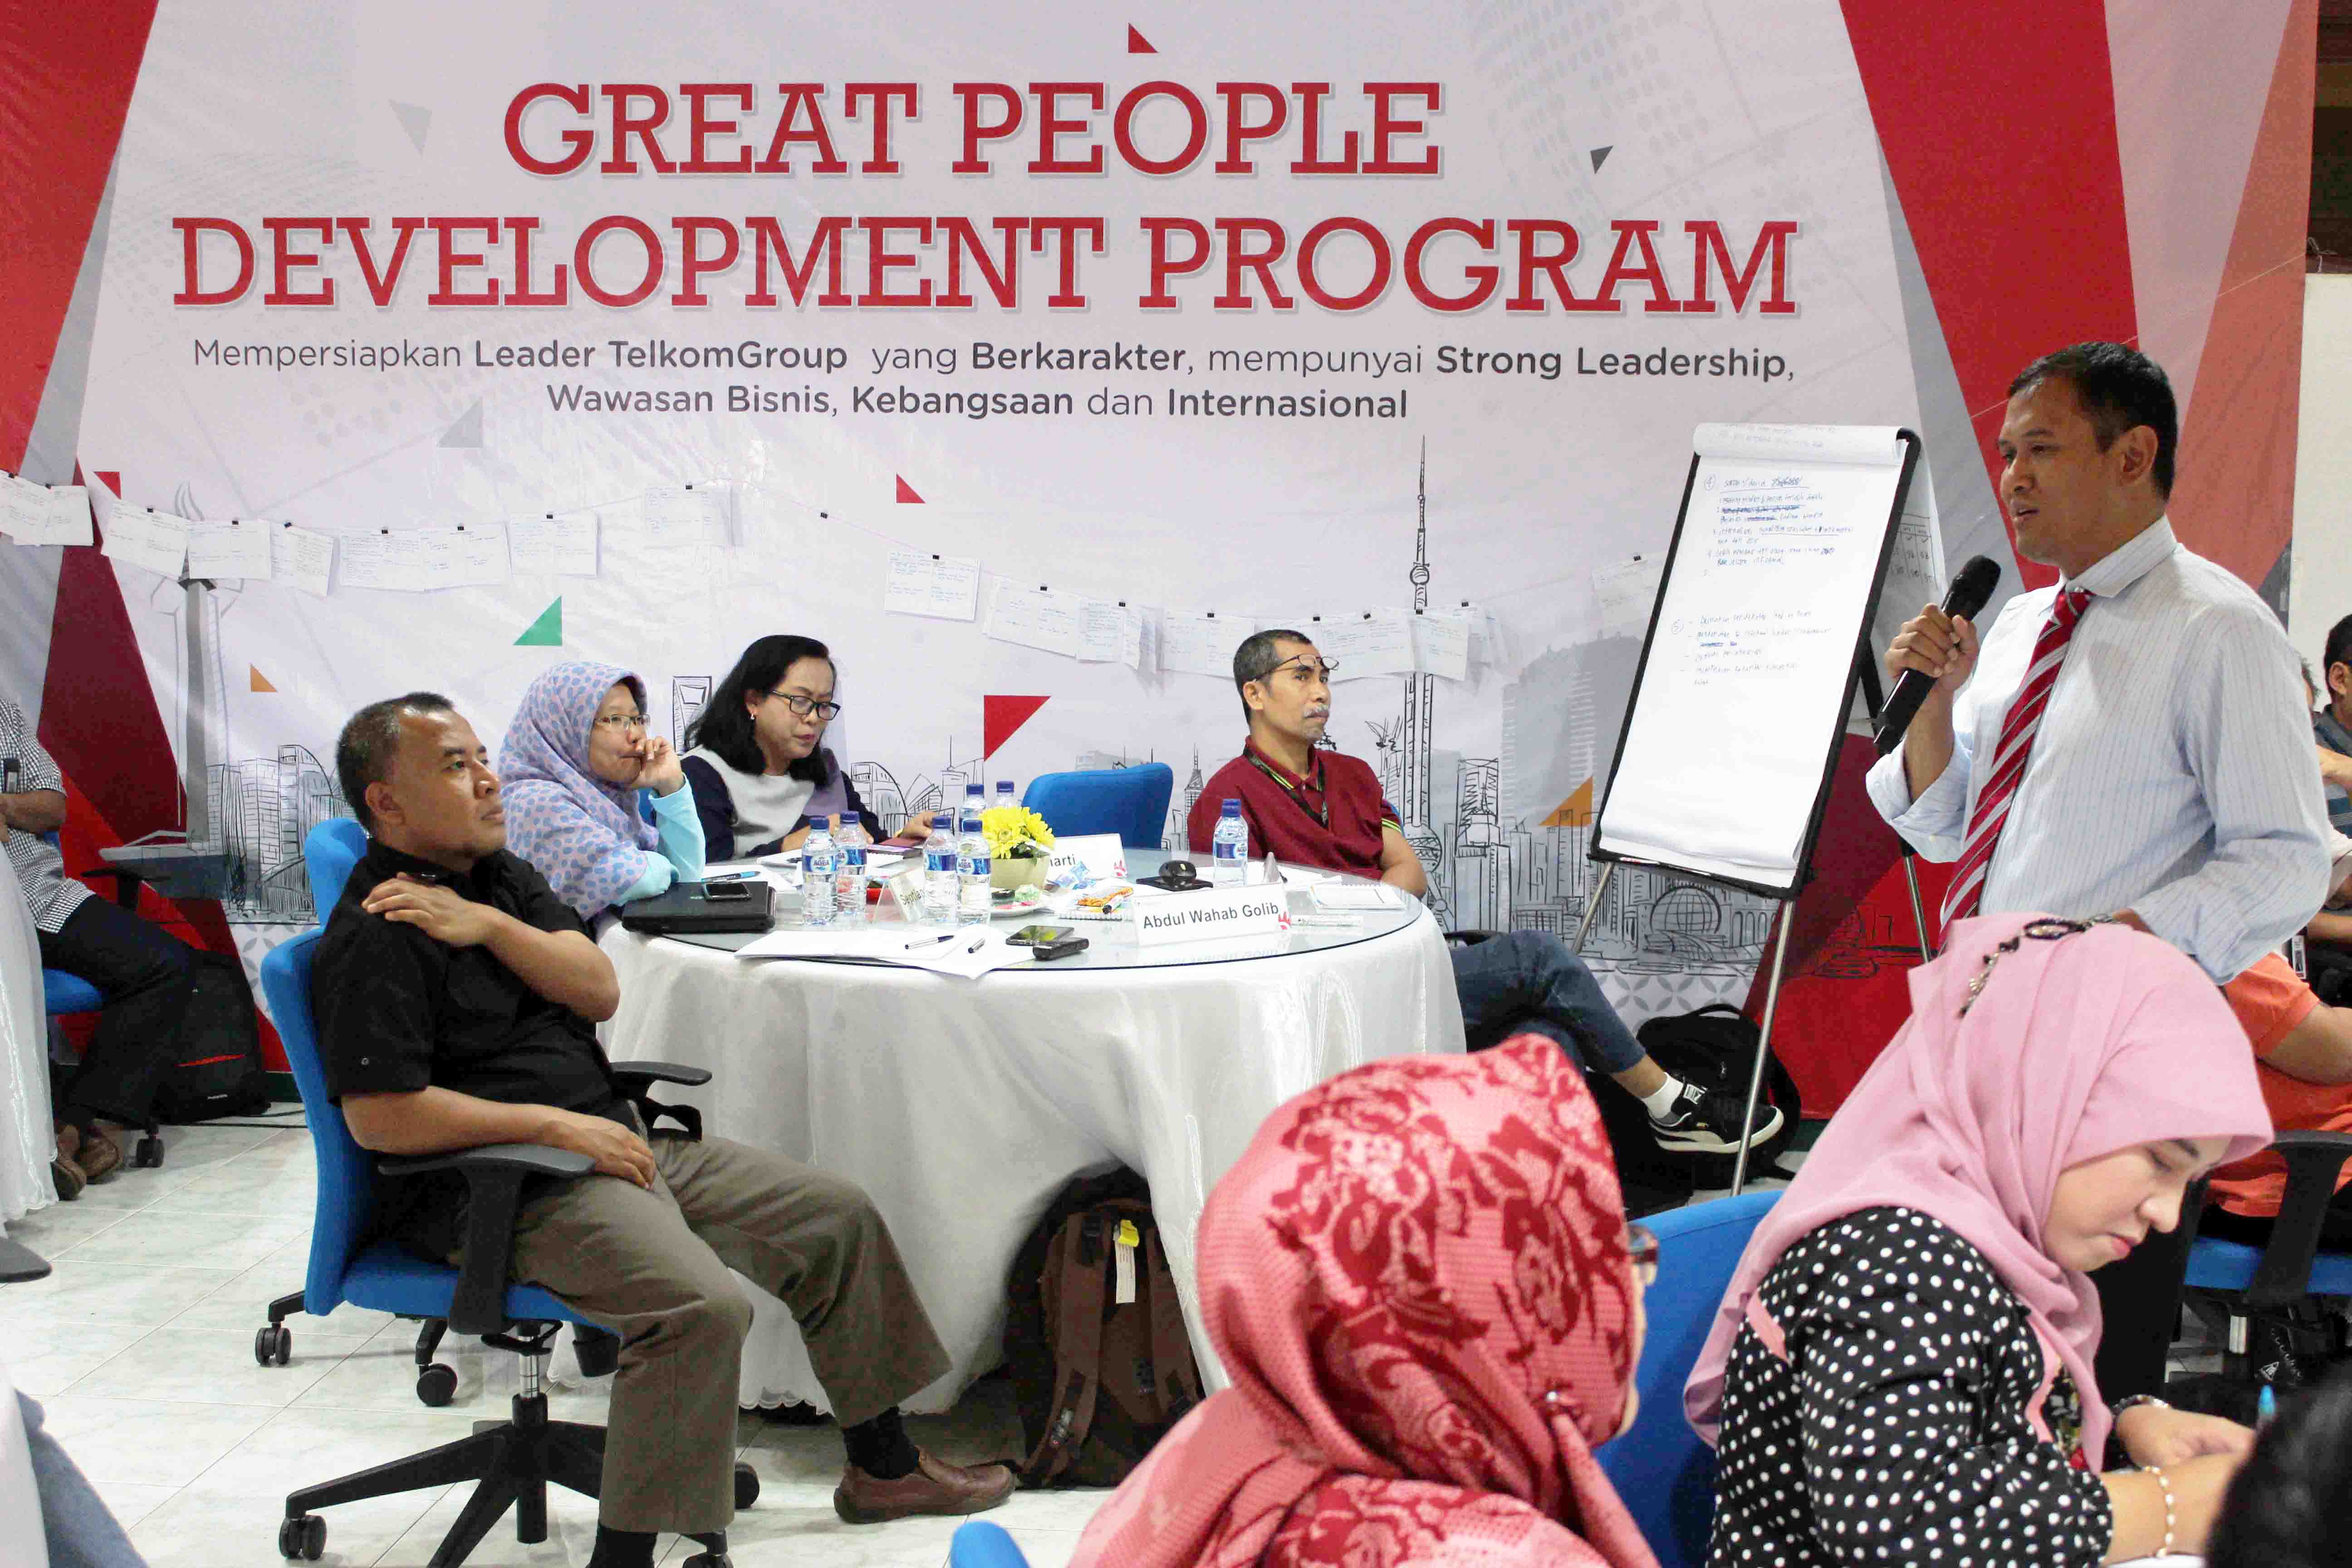 Great PEople Development Program, salah satu program peningkatan kualitas SDM yang dilakukan oleh PT Telkom (petrokimia-gresik.com)